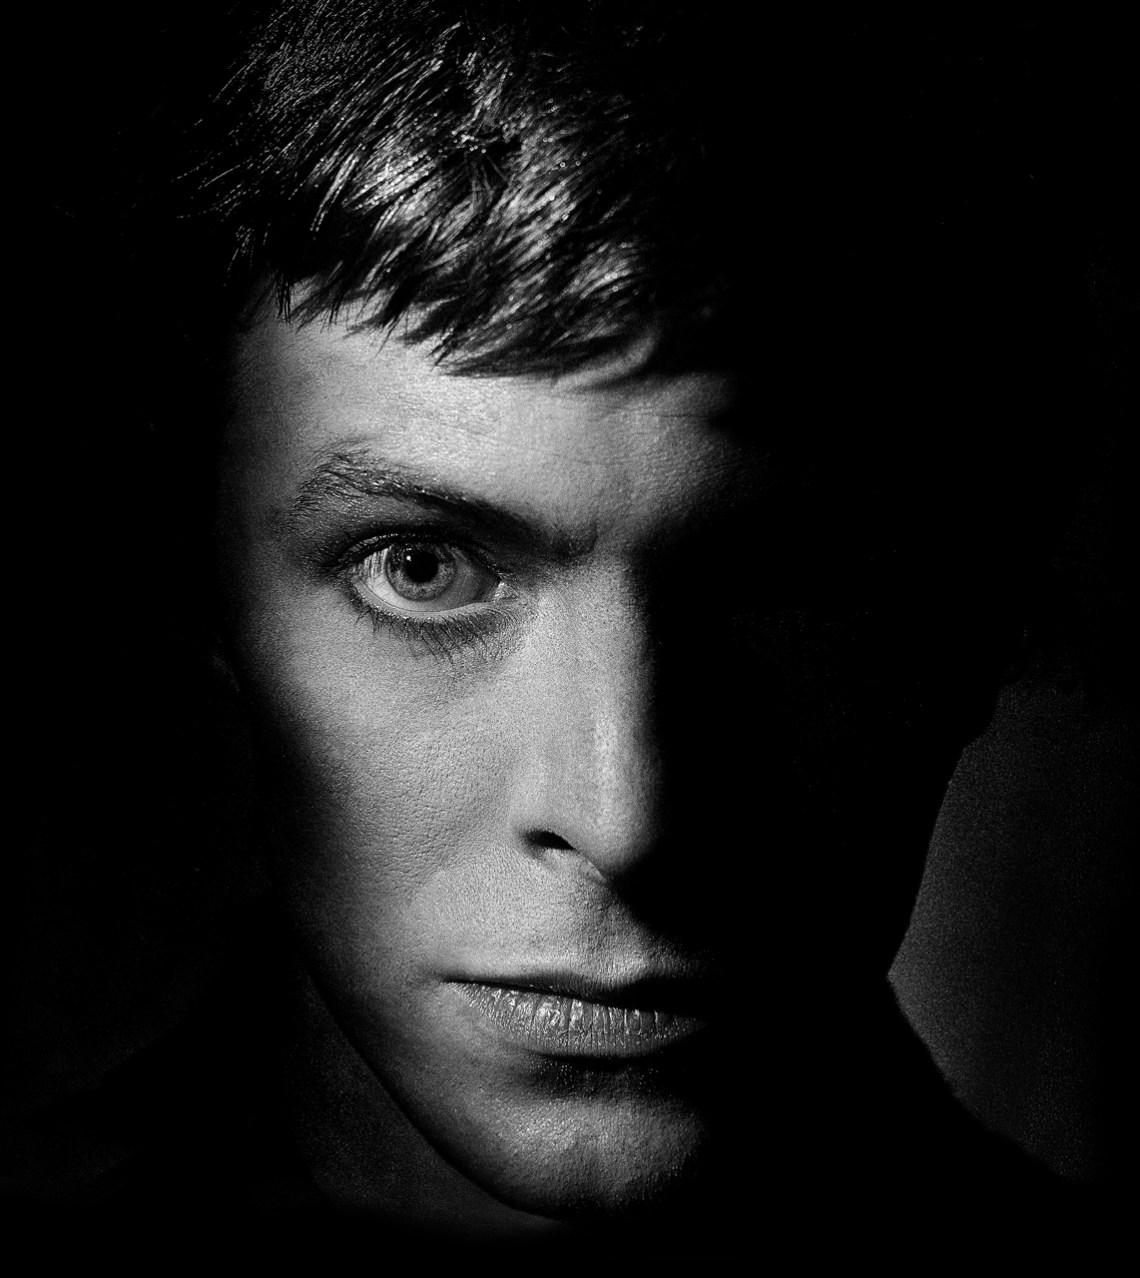 David-Bowie.-Dark.Arrowsmith.Dark.©.jpg